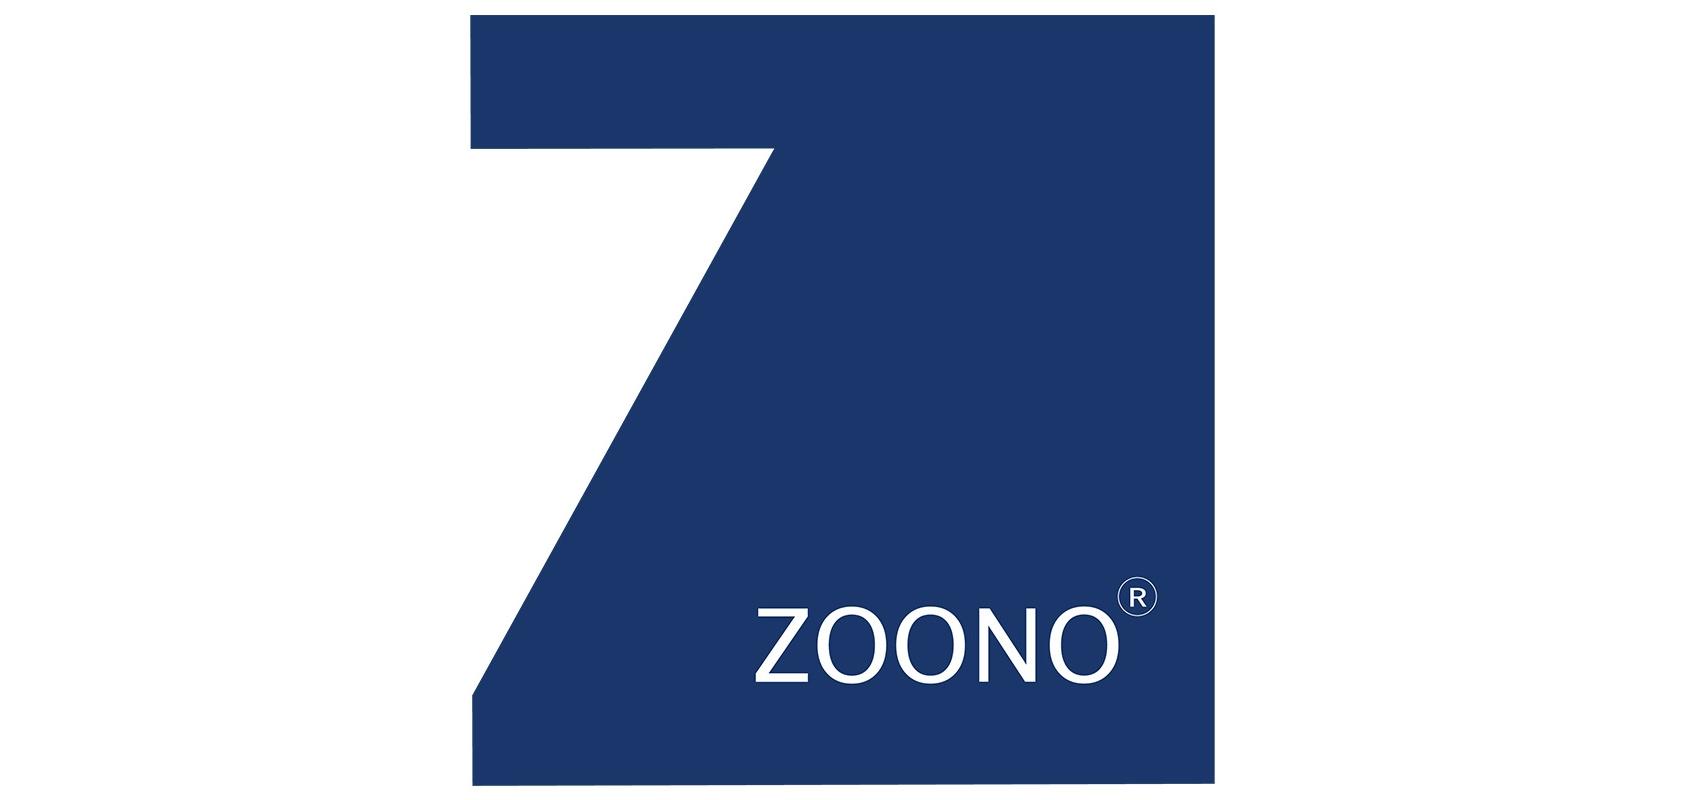 zoono是什么牌子_祖诺品牌怎么样?